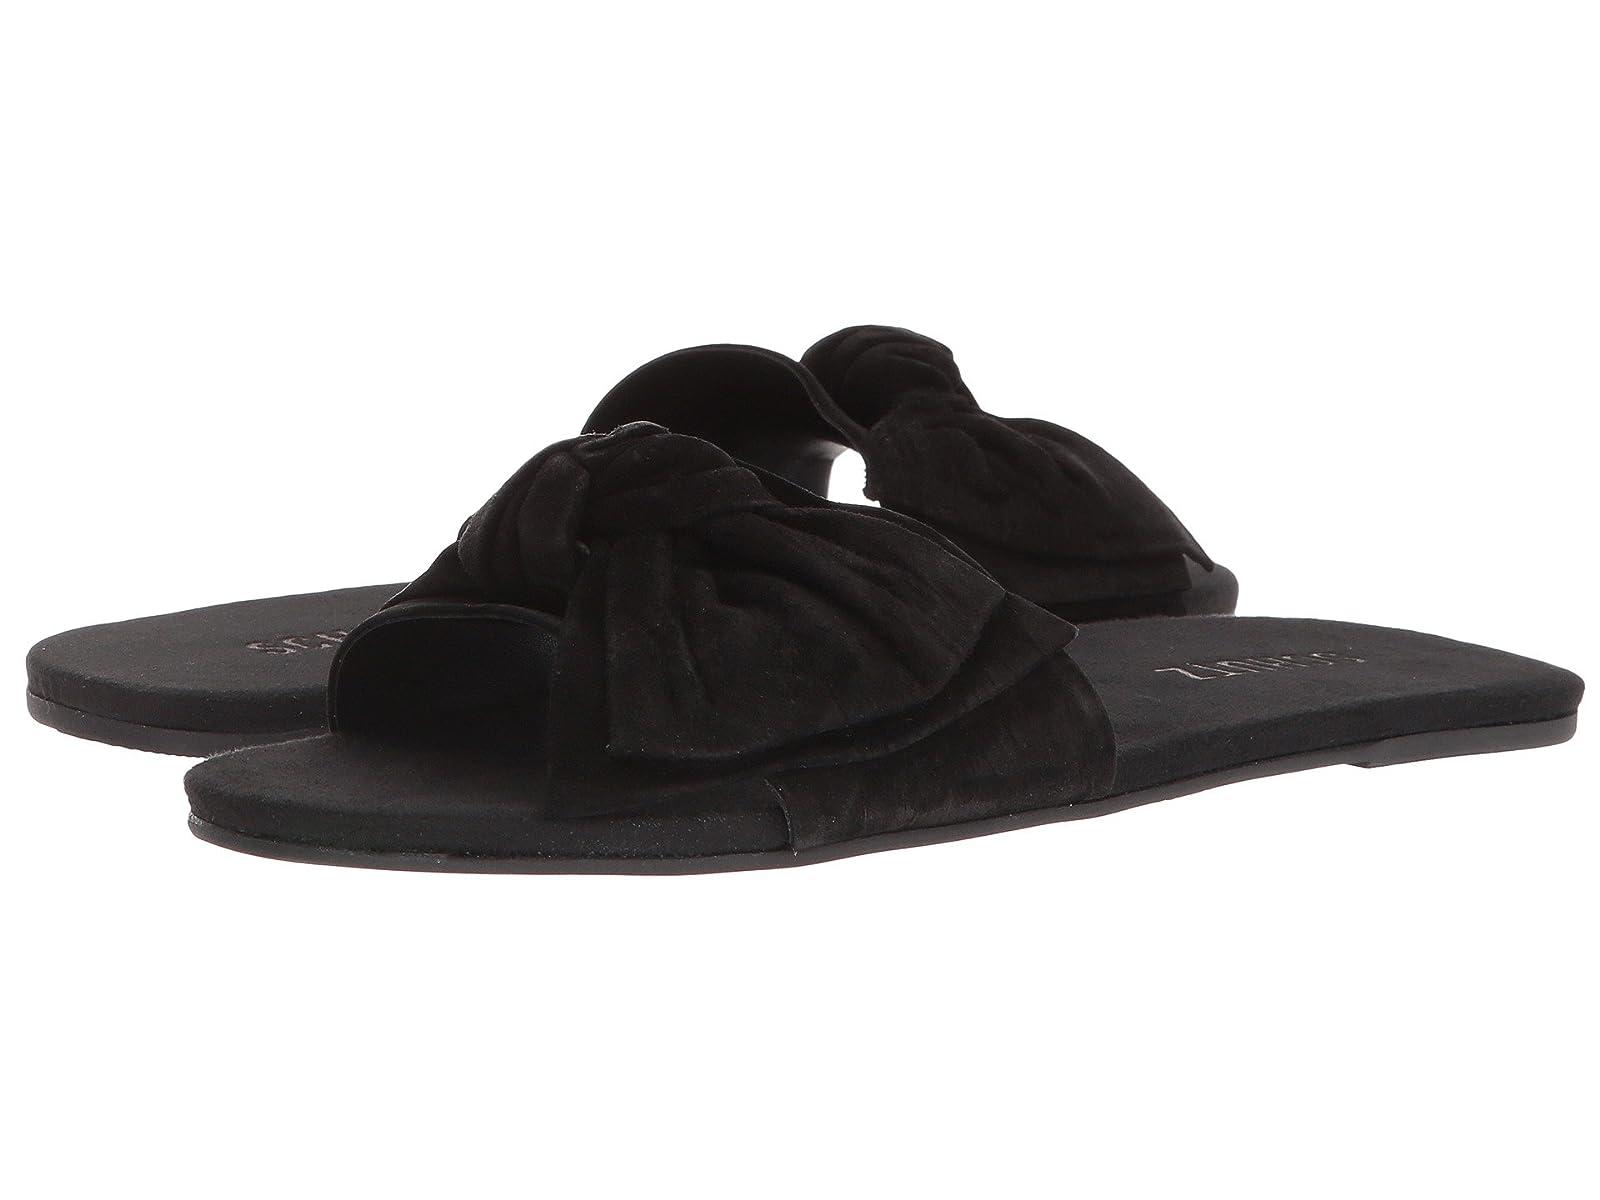 Schutz WendineCheap and distinctive eye-catching shoes